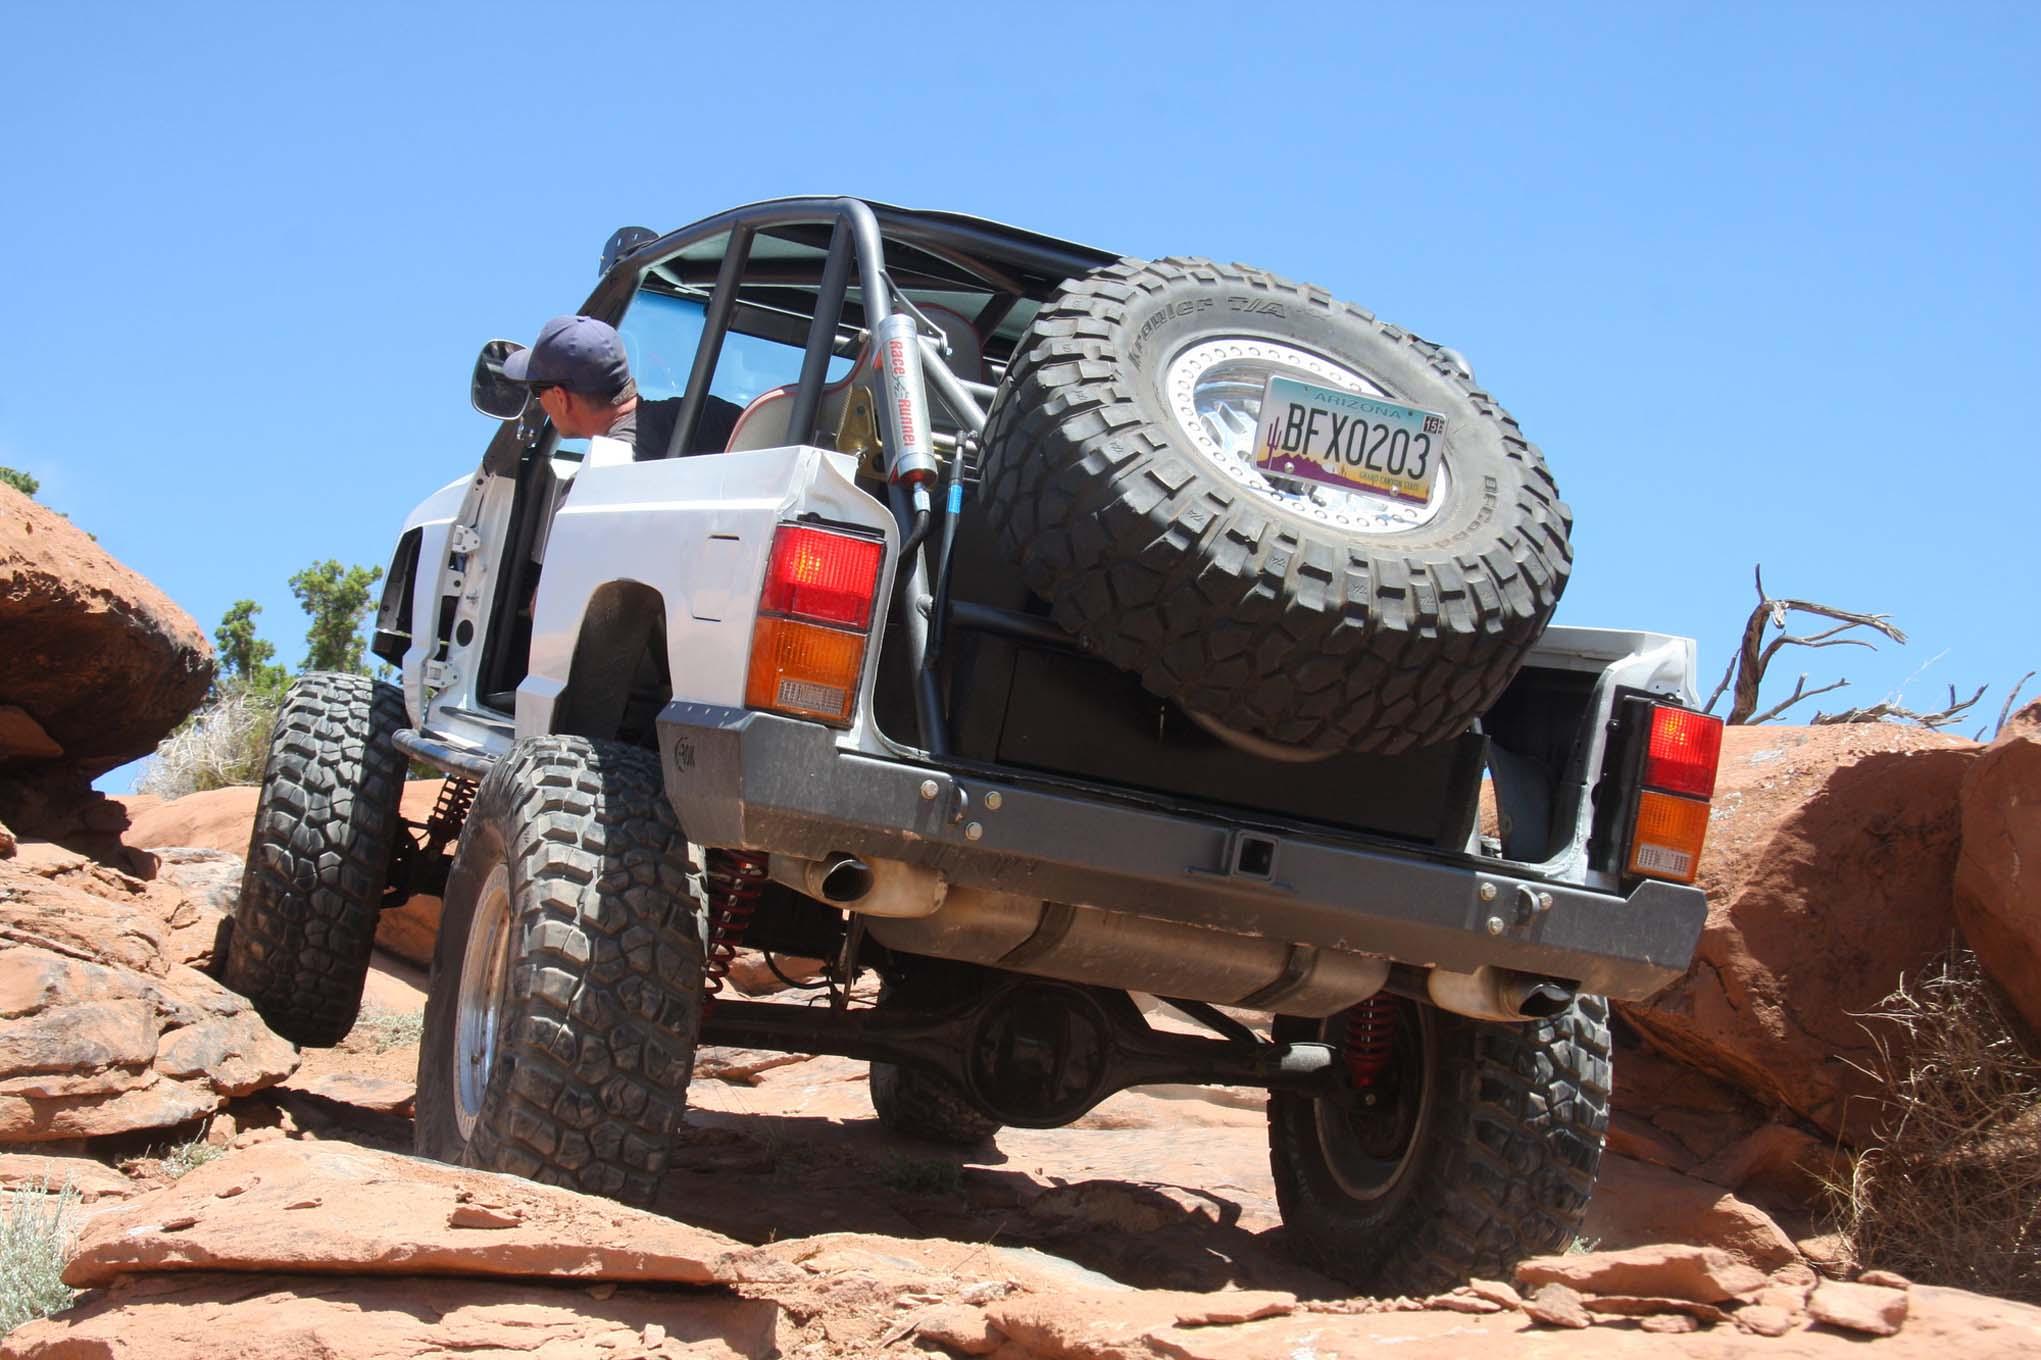 011 Topless Cherokee Xj Front Three Quarter Action Lpr